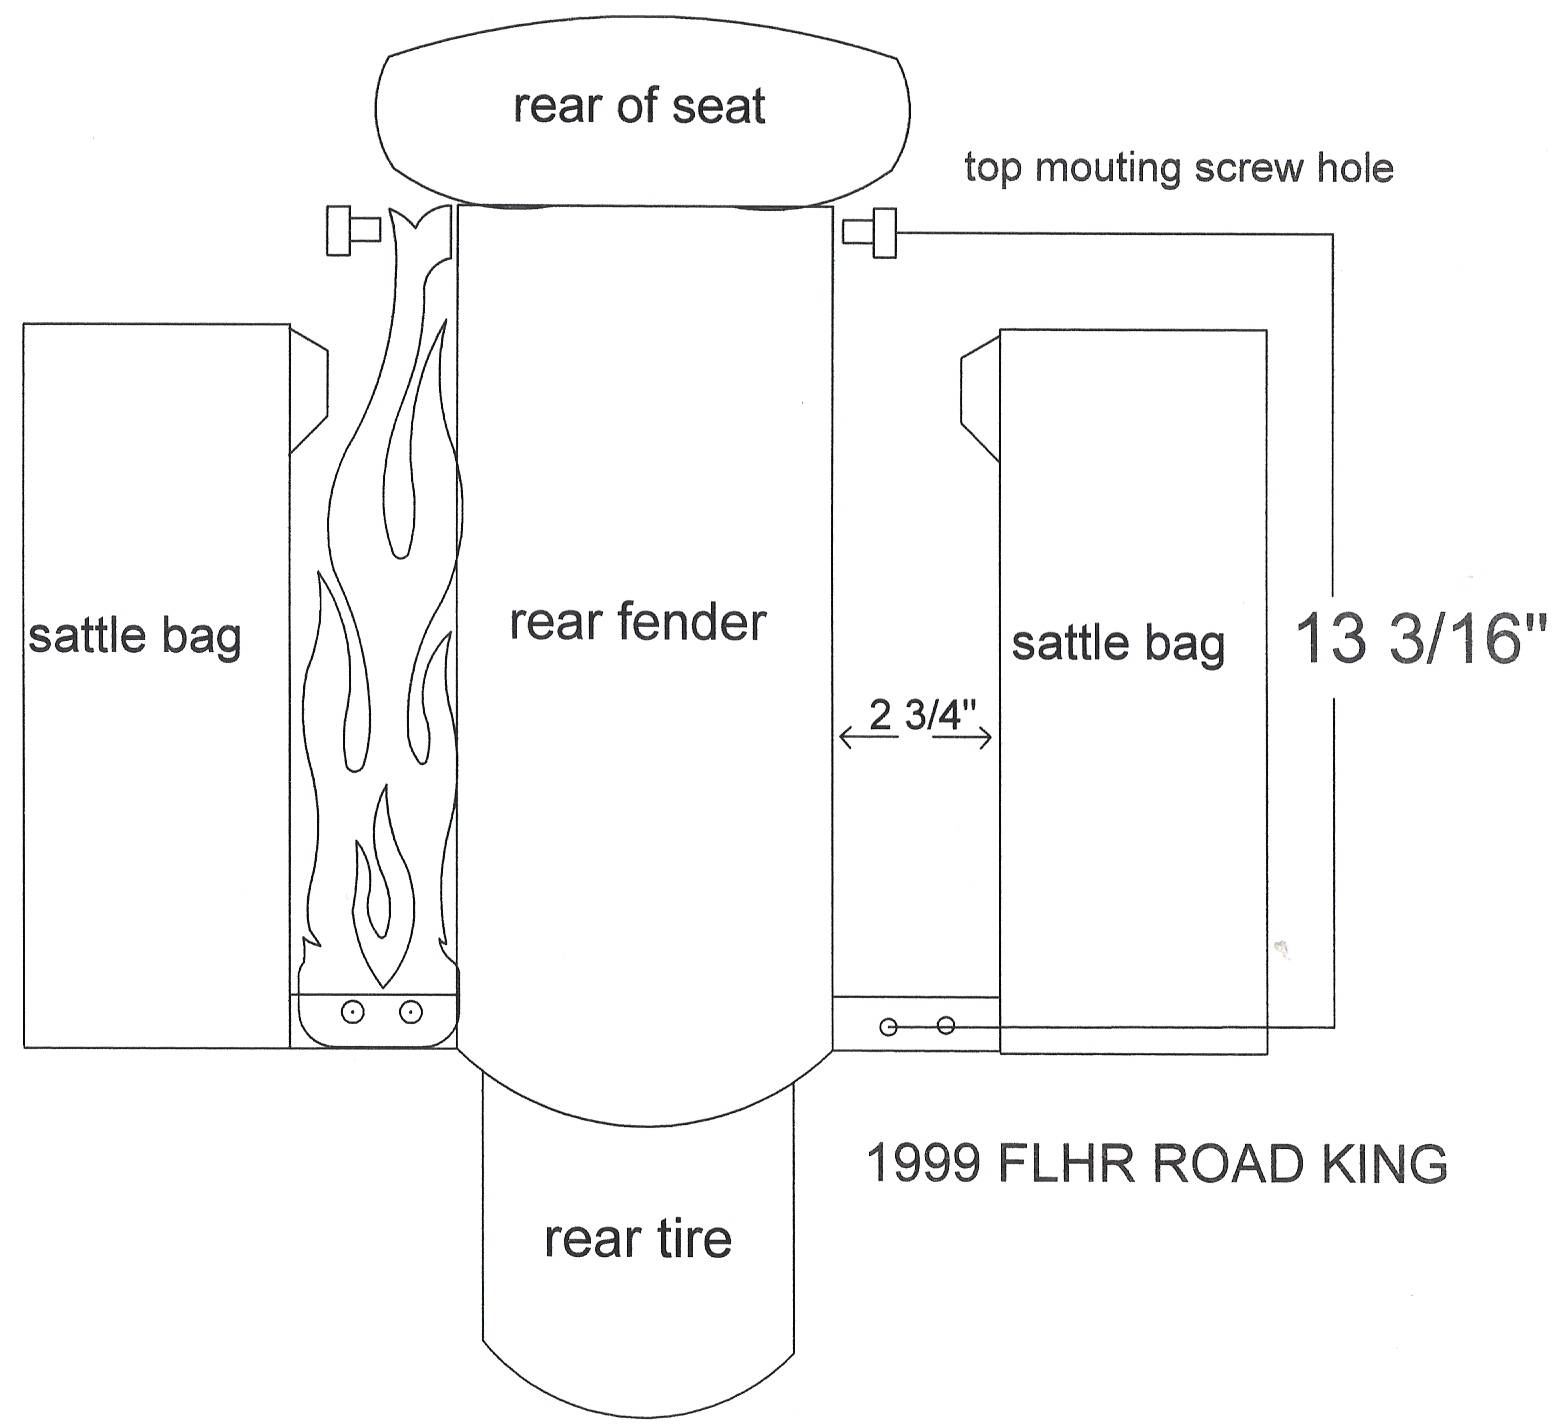 1999 FLHR ROAD KING